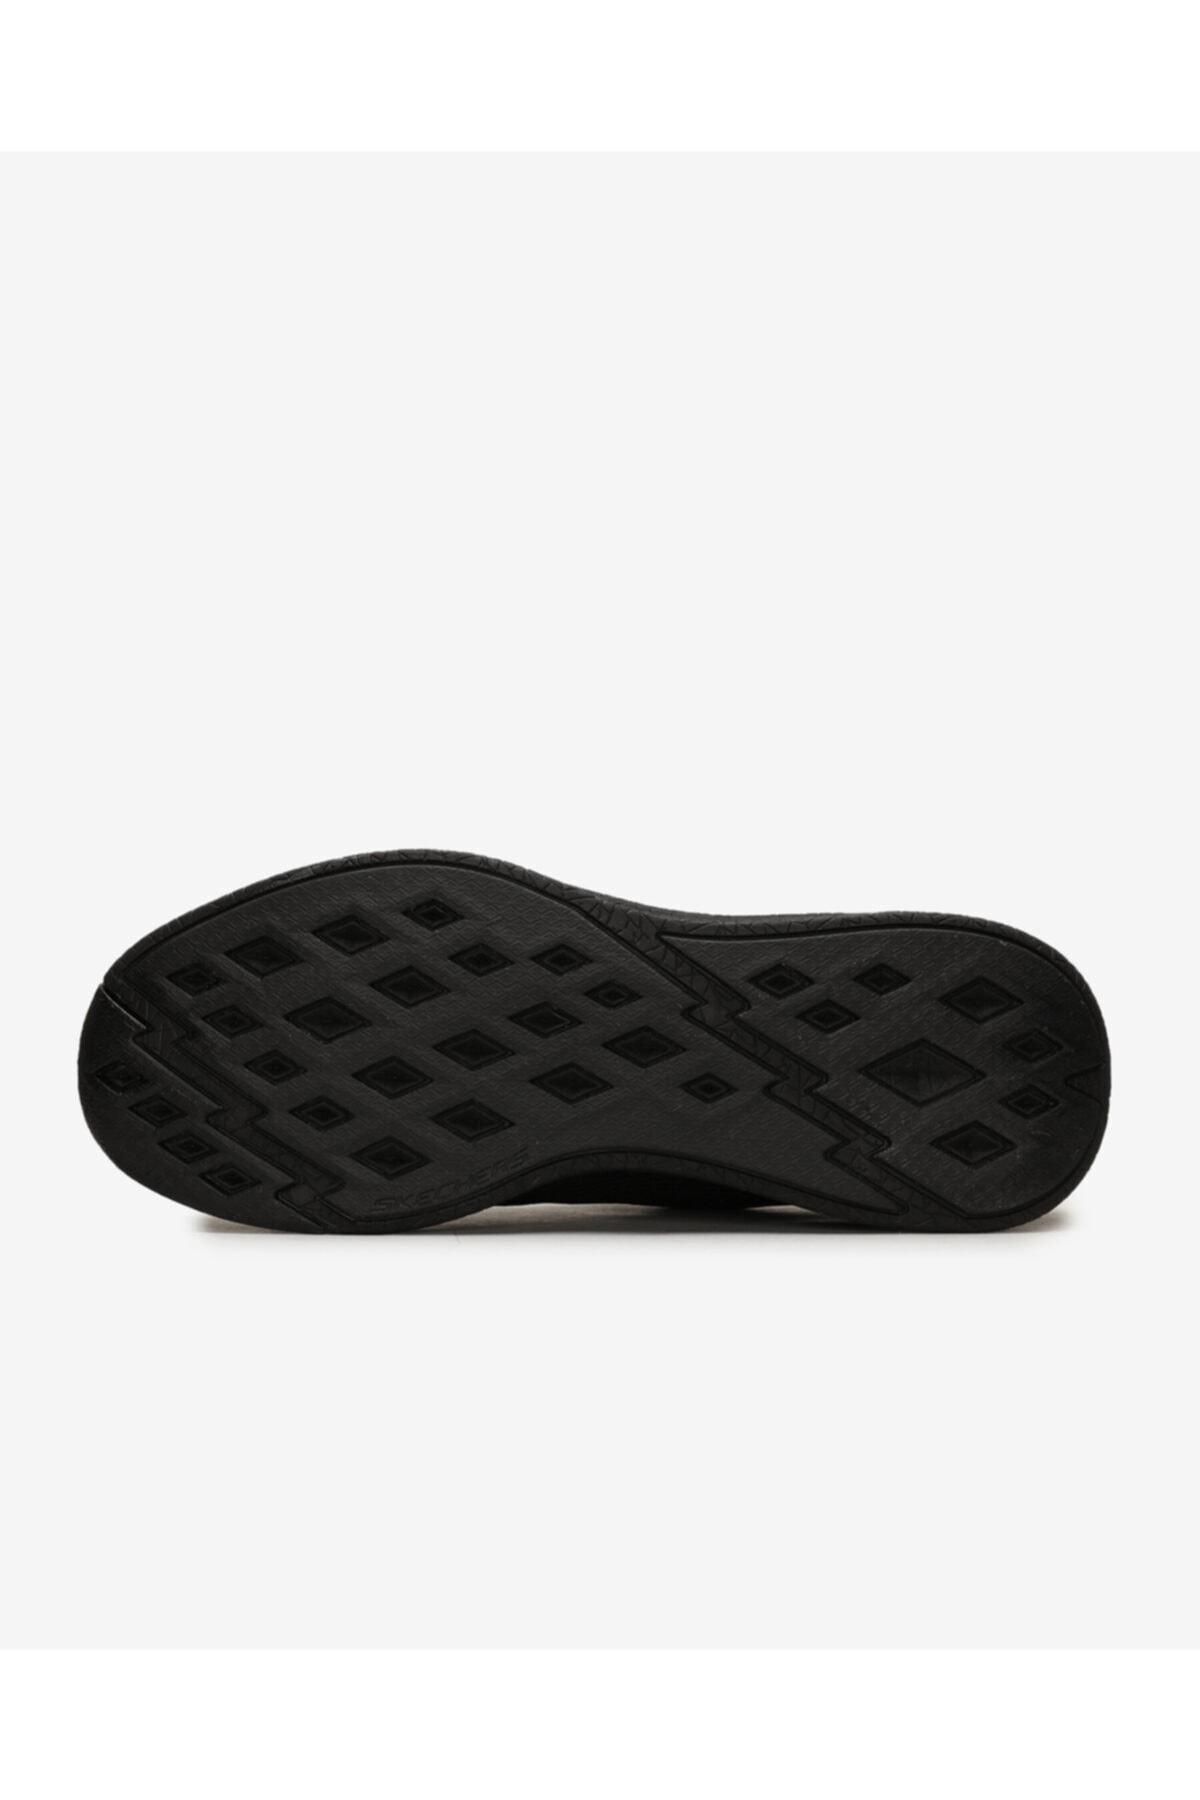 Skechers BURST 2.0- OUT OF RANGE. Erkek Siyah Spor Ayakkabı